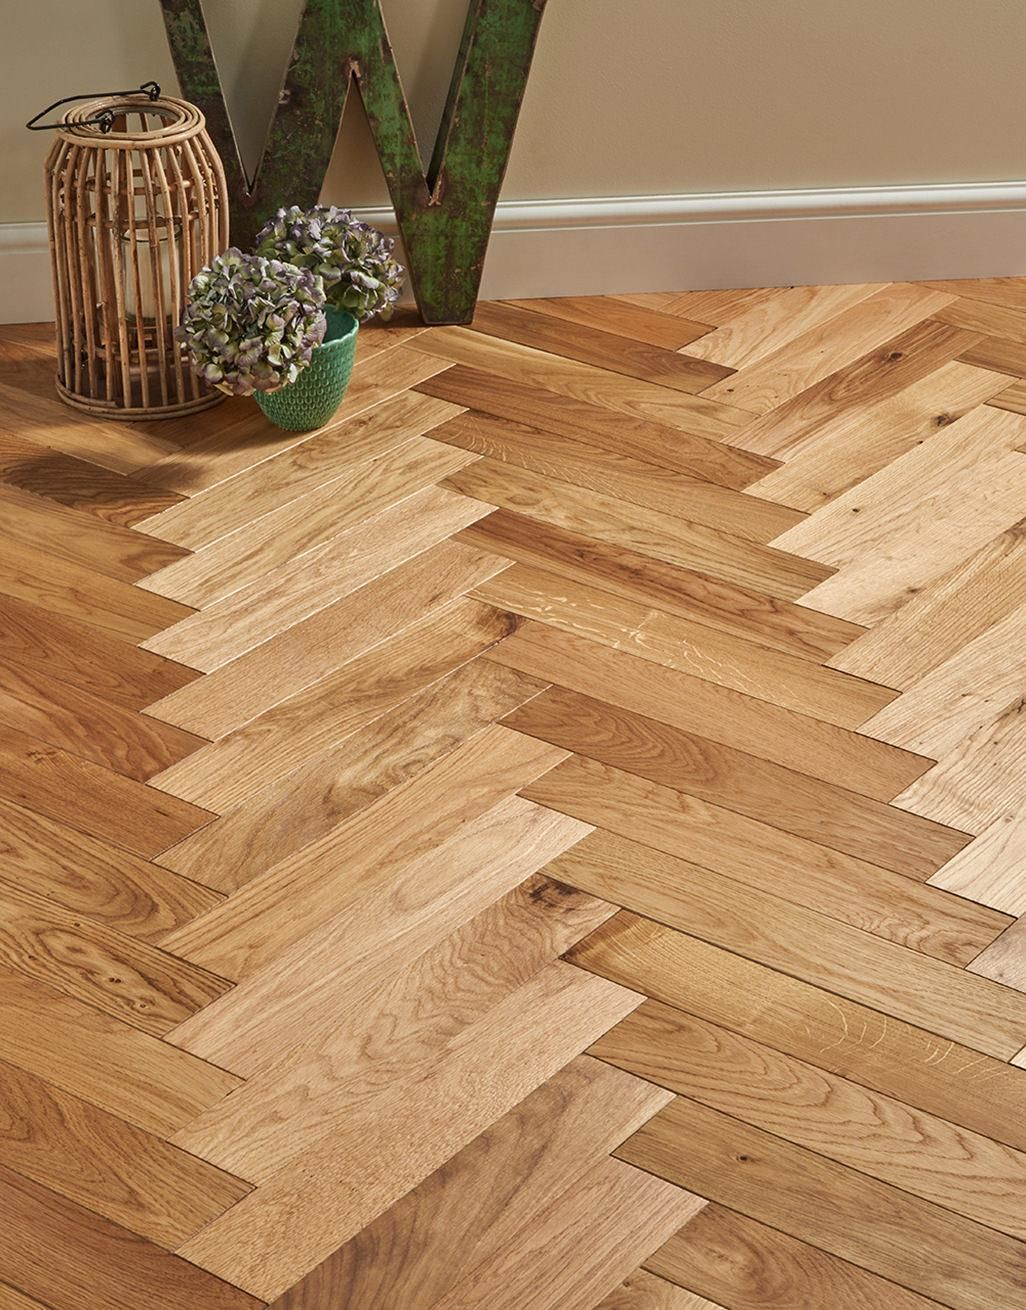 Trade Select Natural Oiled Herringbone Parquet Oak Solid Wood Flooring